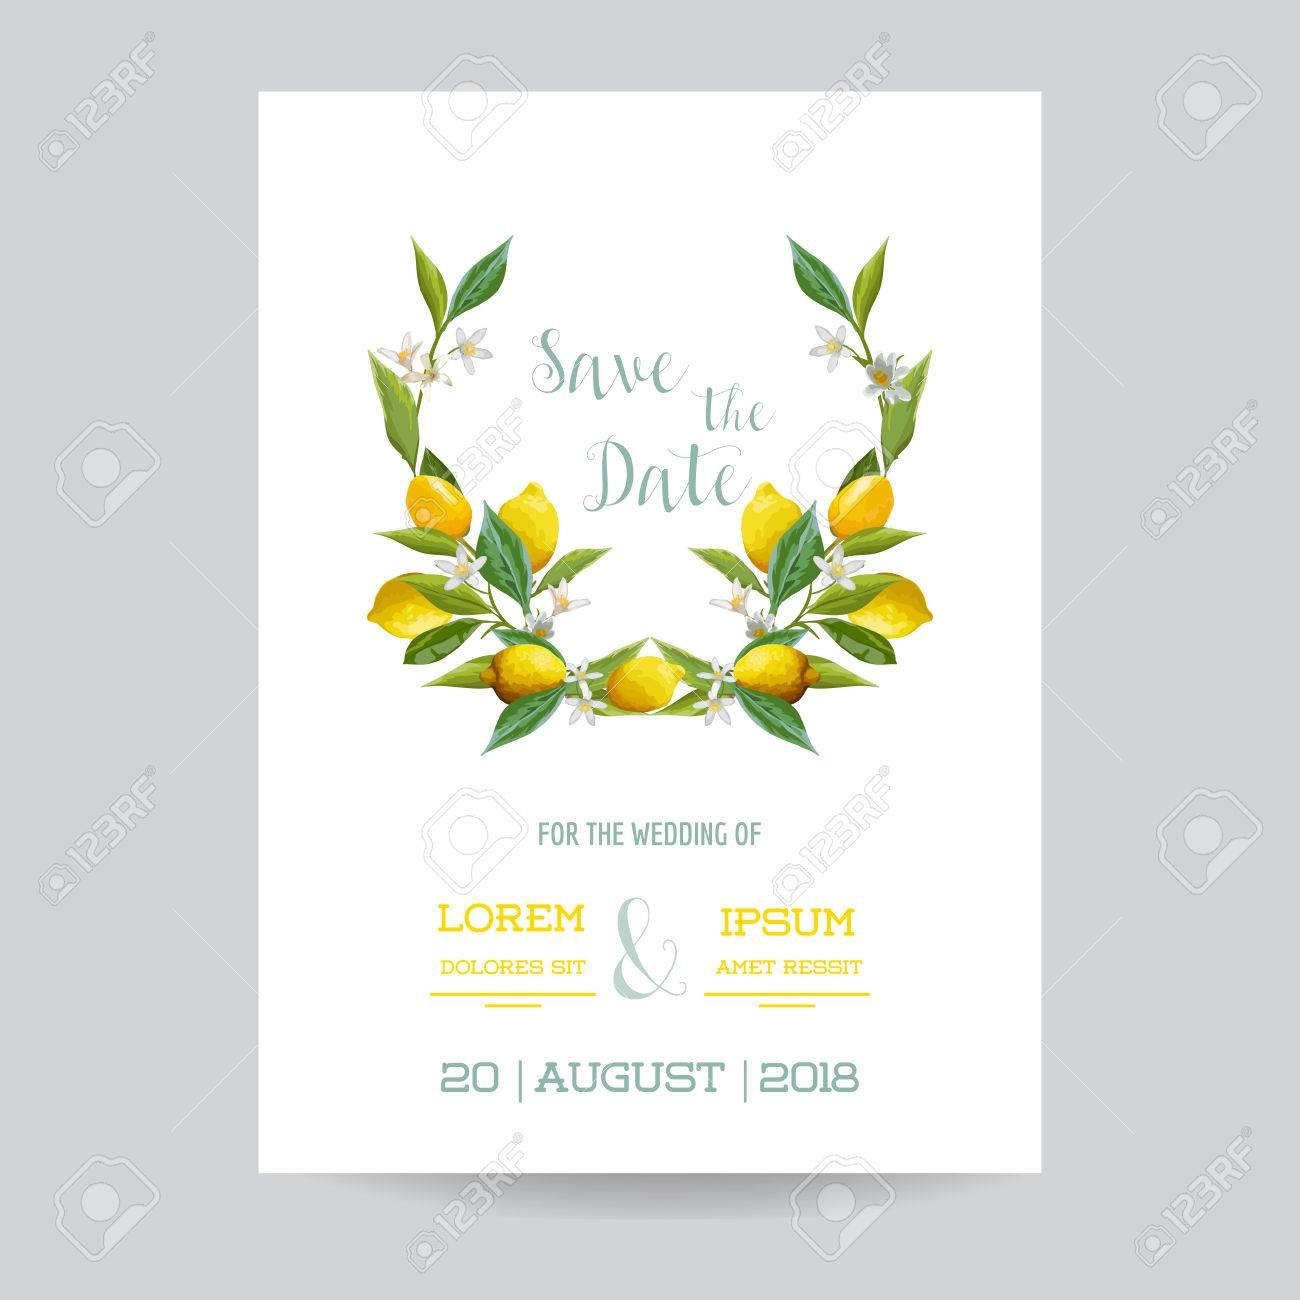 save the date wedding invitation or congratulation card set